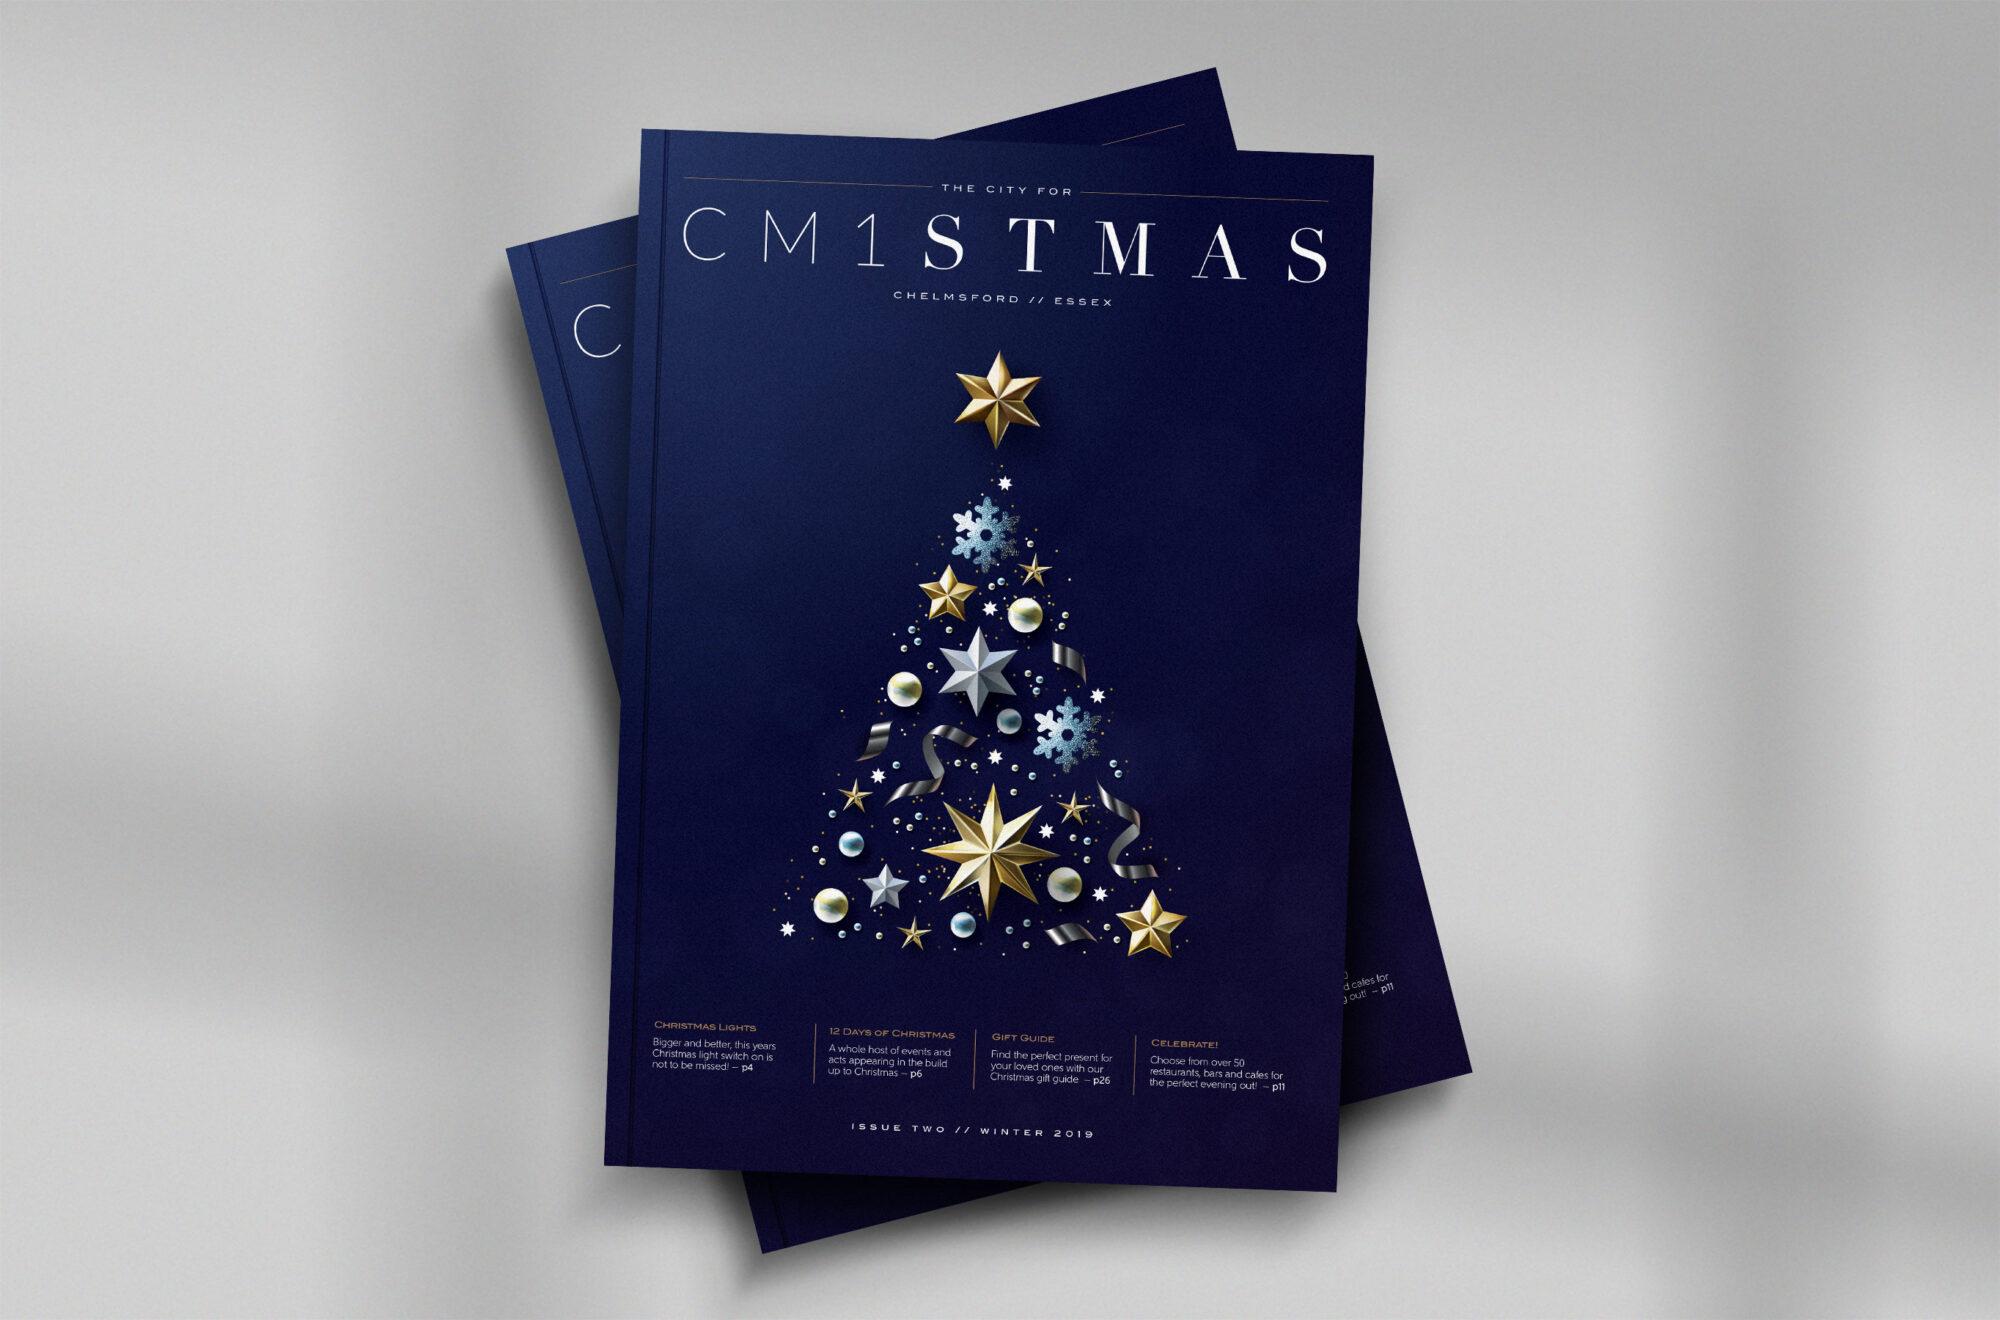 CM1stmas Chelmsford Christmas magazine 2019